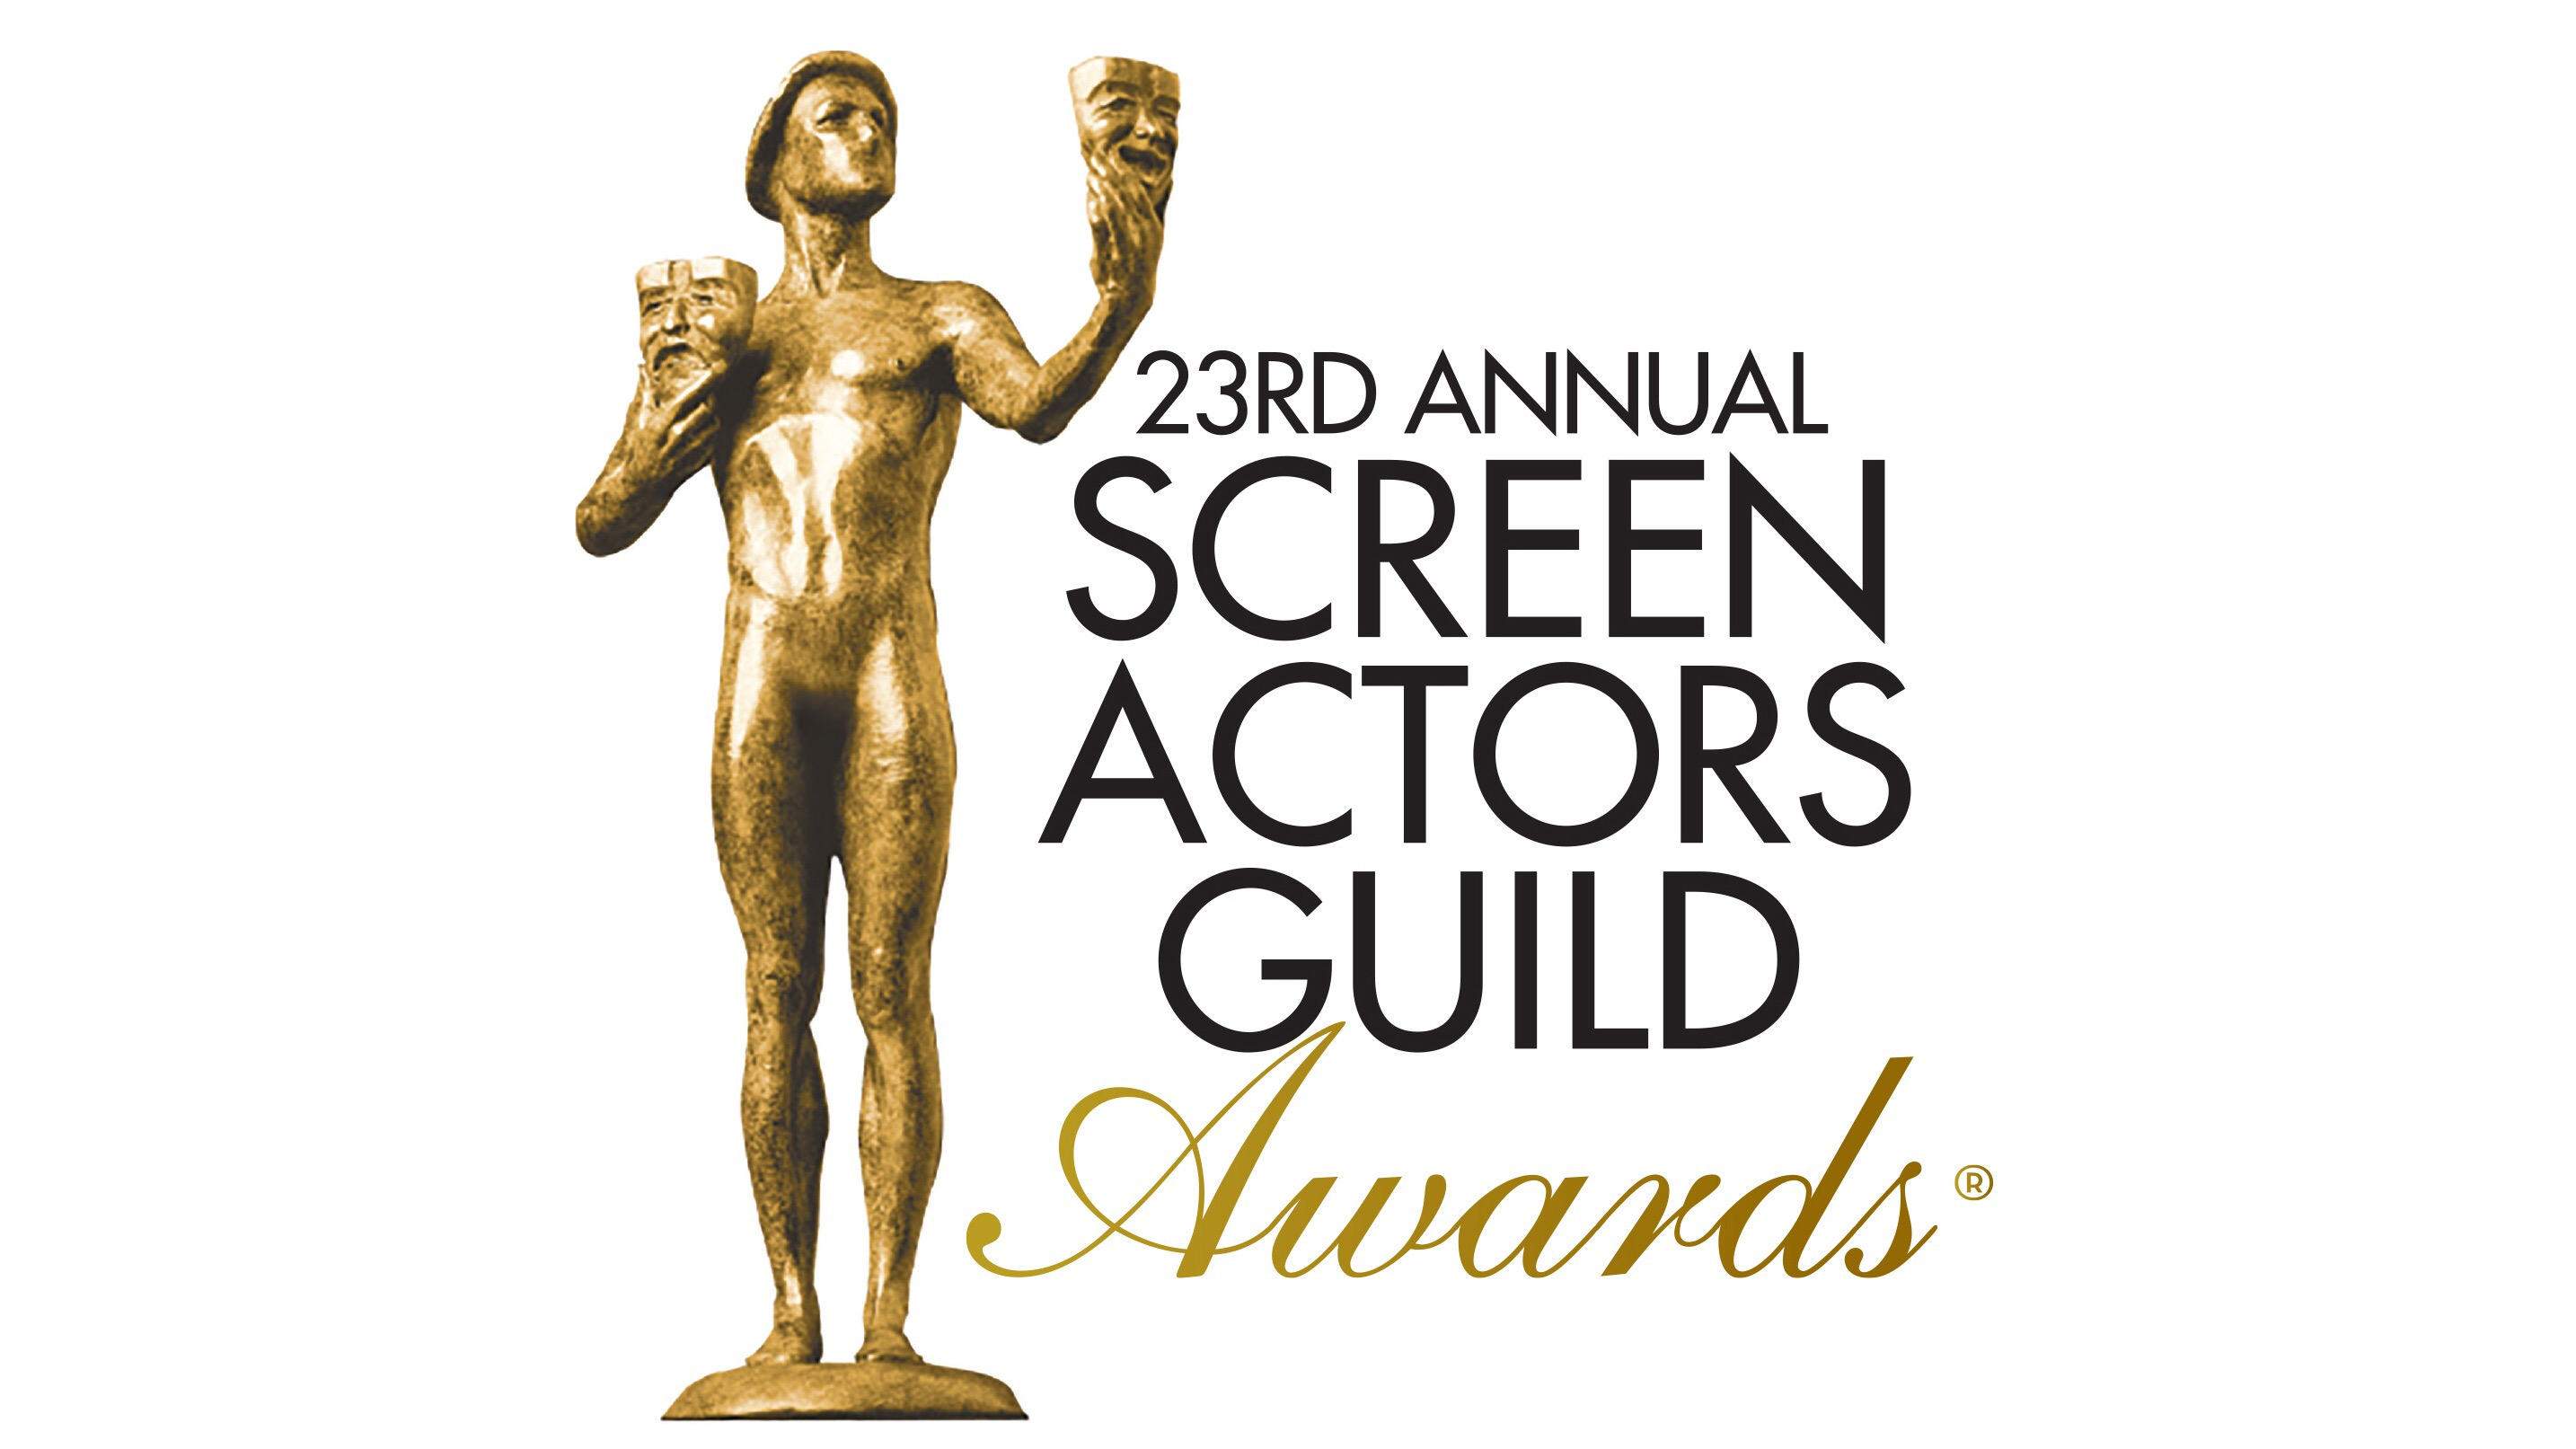 SAG Awards Screen Actor's Guild Awards